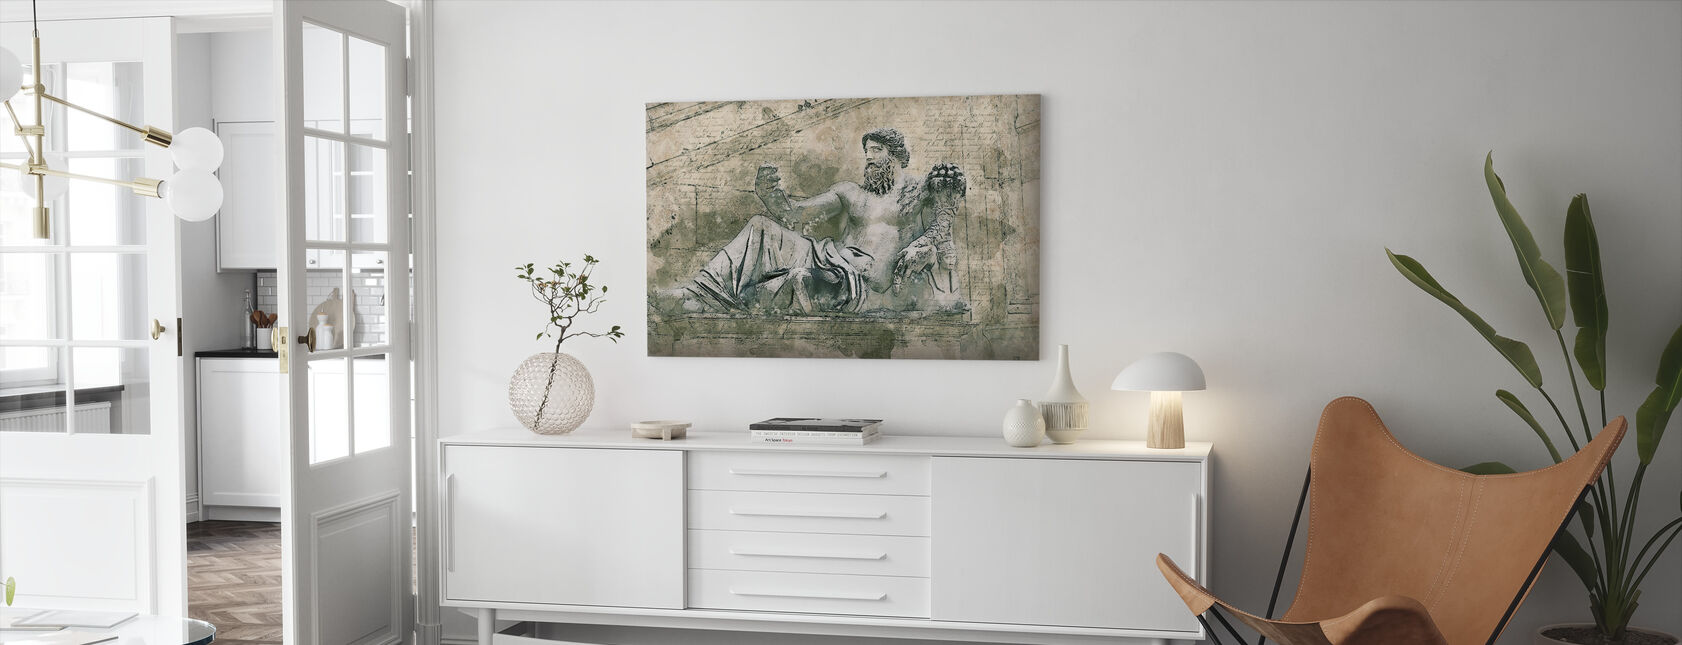 Rome Vintage Statue - Canvas print - Living Room